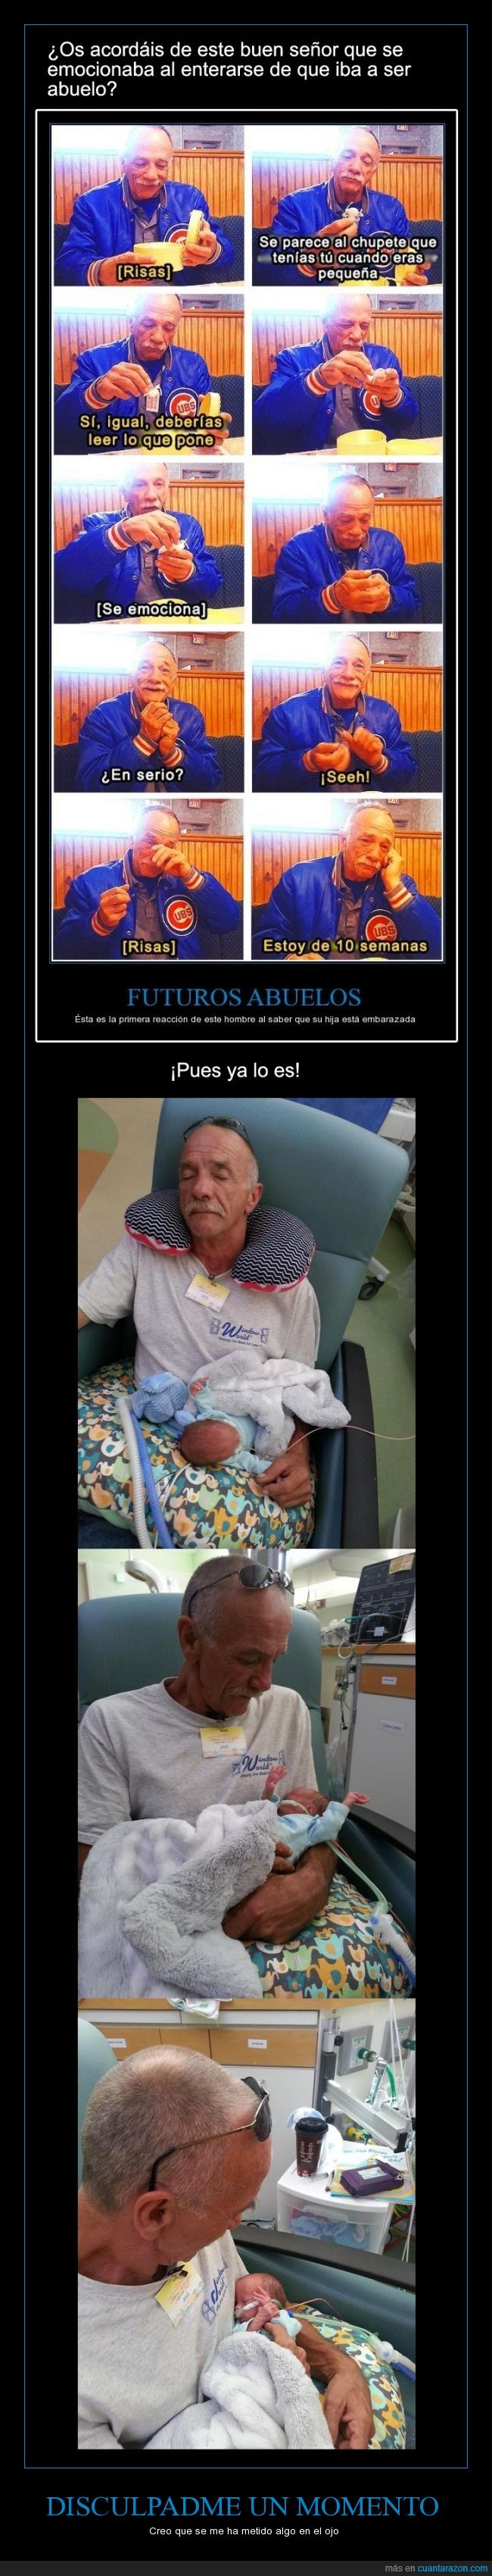 abuelo,bebe,chupete,continuacion,feliz,hija,hijo,historia,hospital,las historias felices molan,nacido,nieta,nieto,pequeño